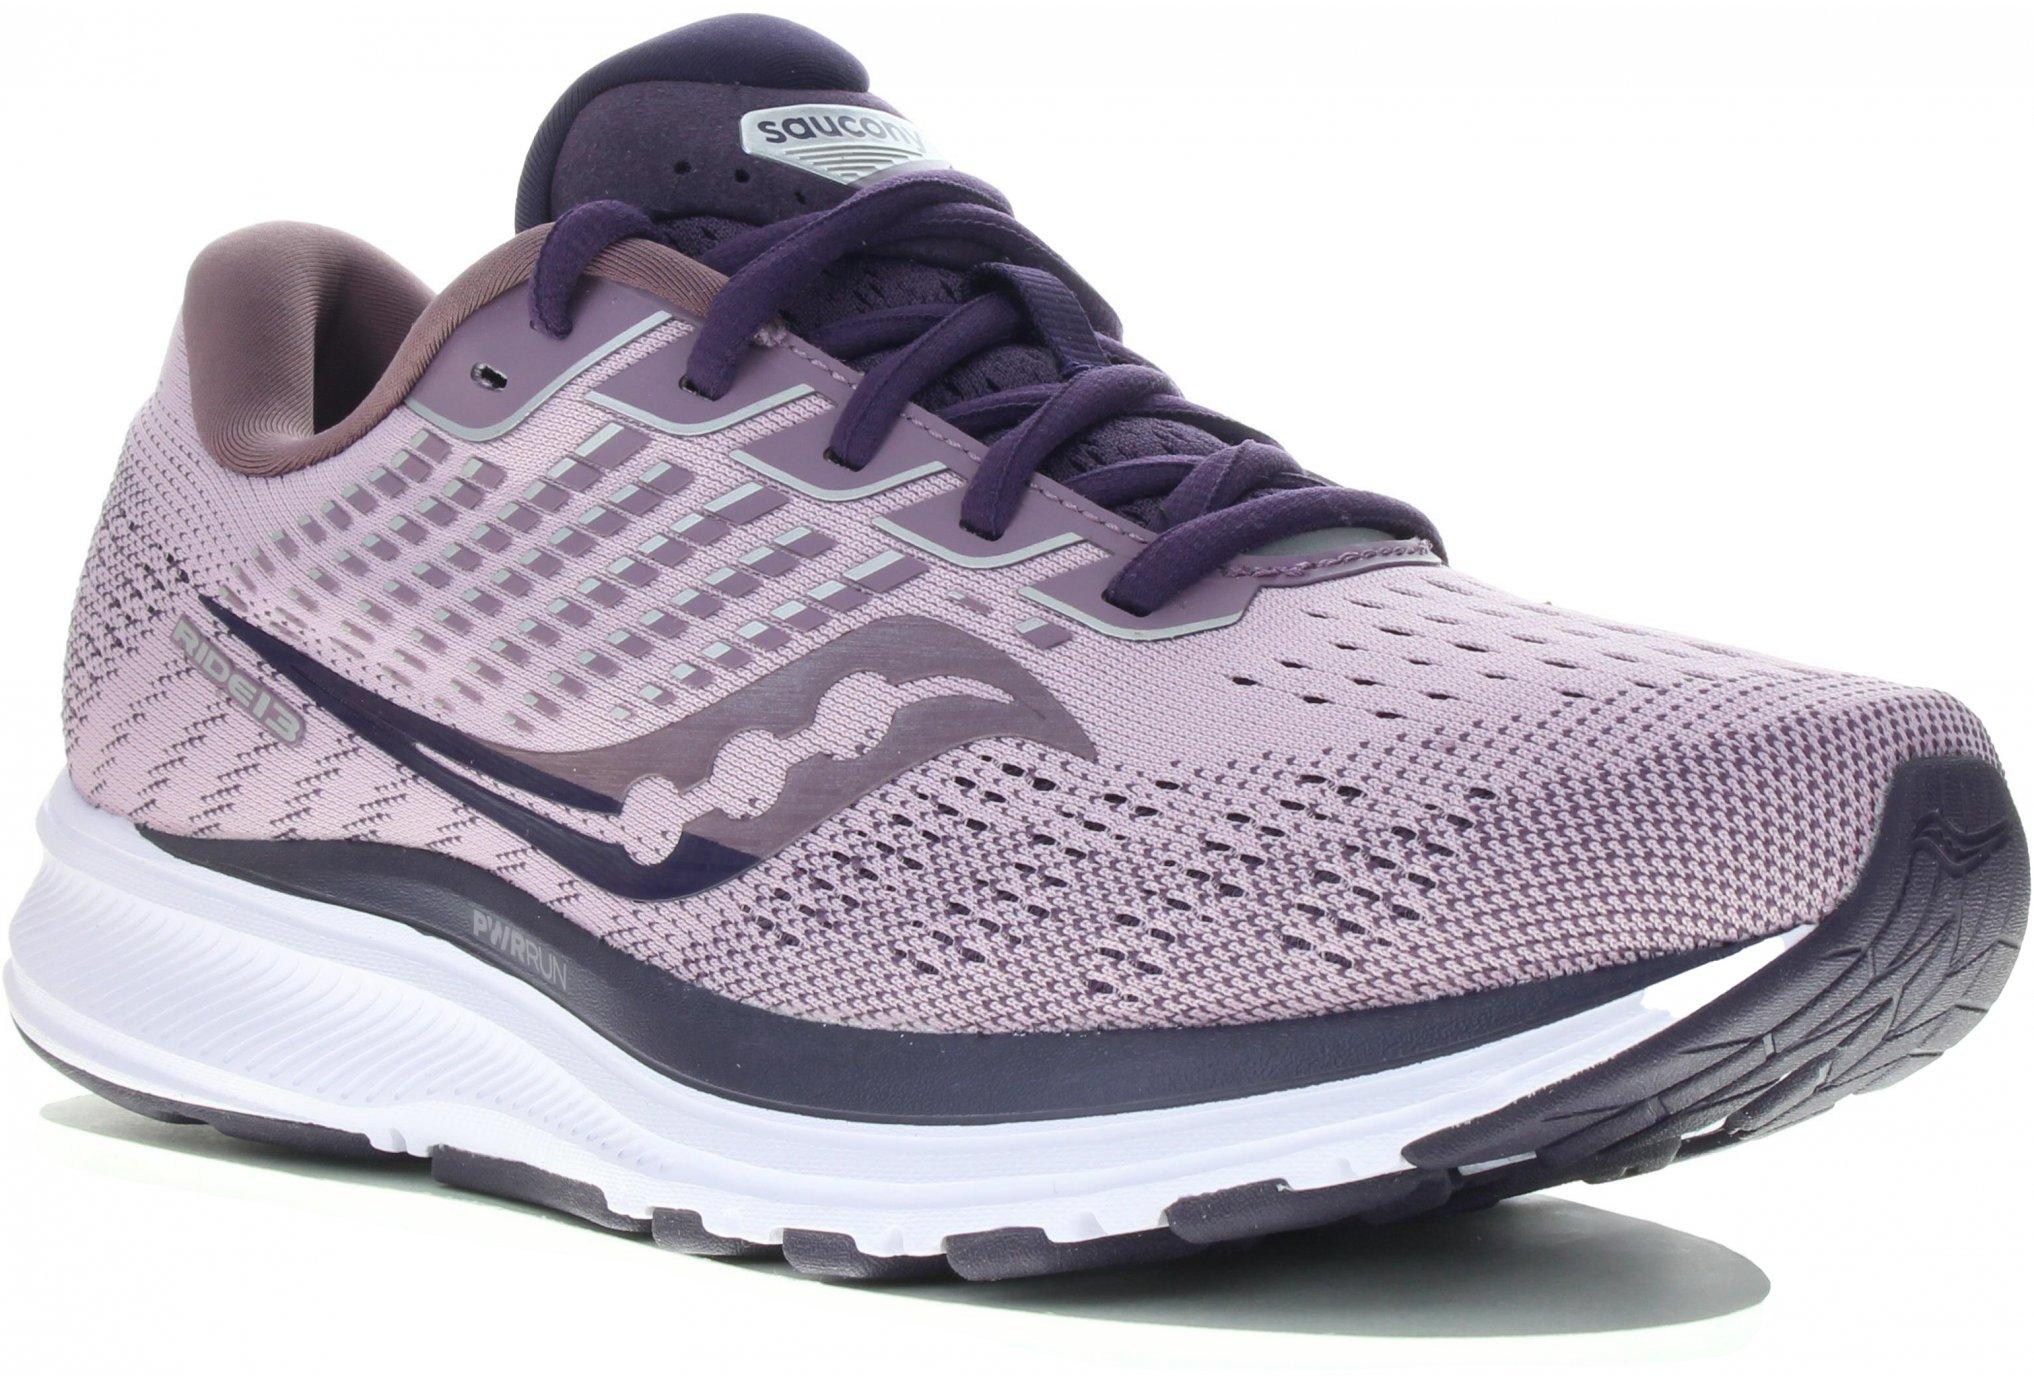 Saucony Ride 13 Chaussures running femme